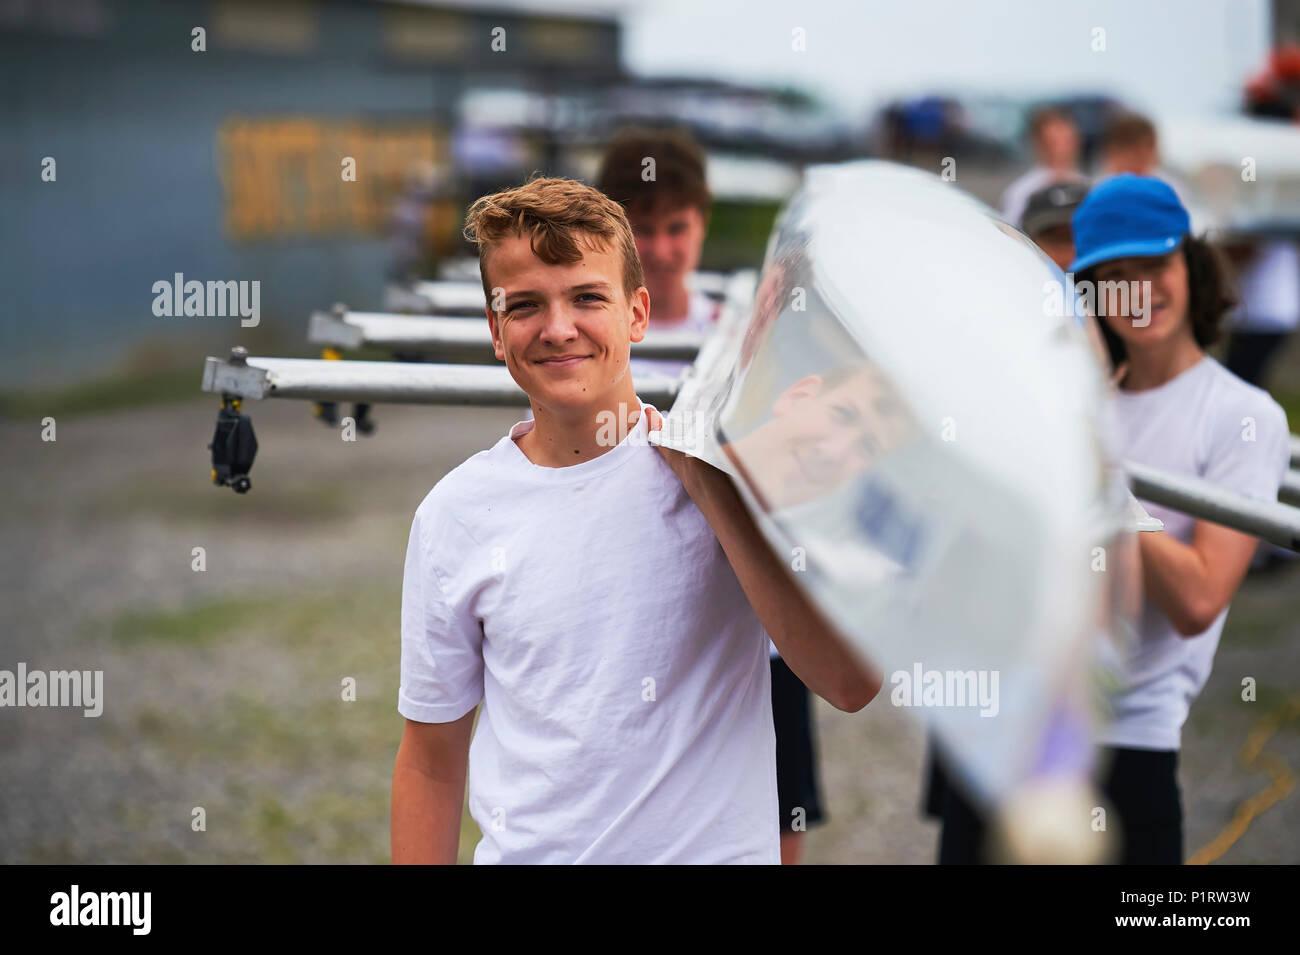 Quad Hommes junior du Club de bateau de Hanlan portant un voile; Toronto, Ontario, Canada Photo Stock